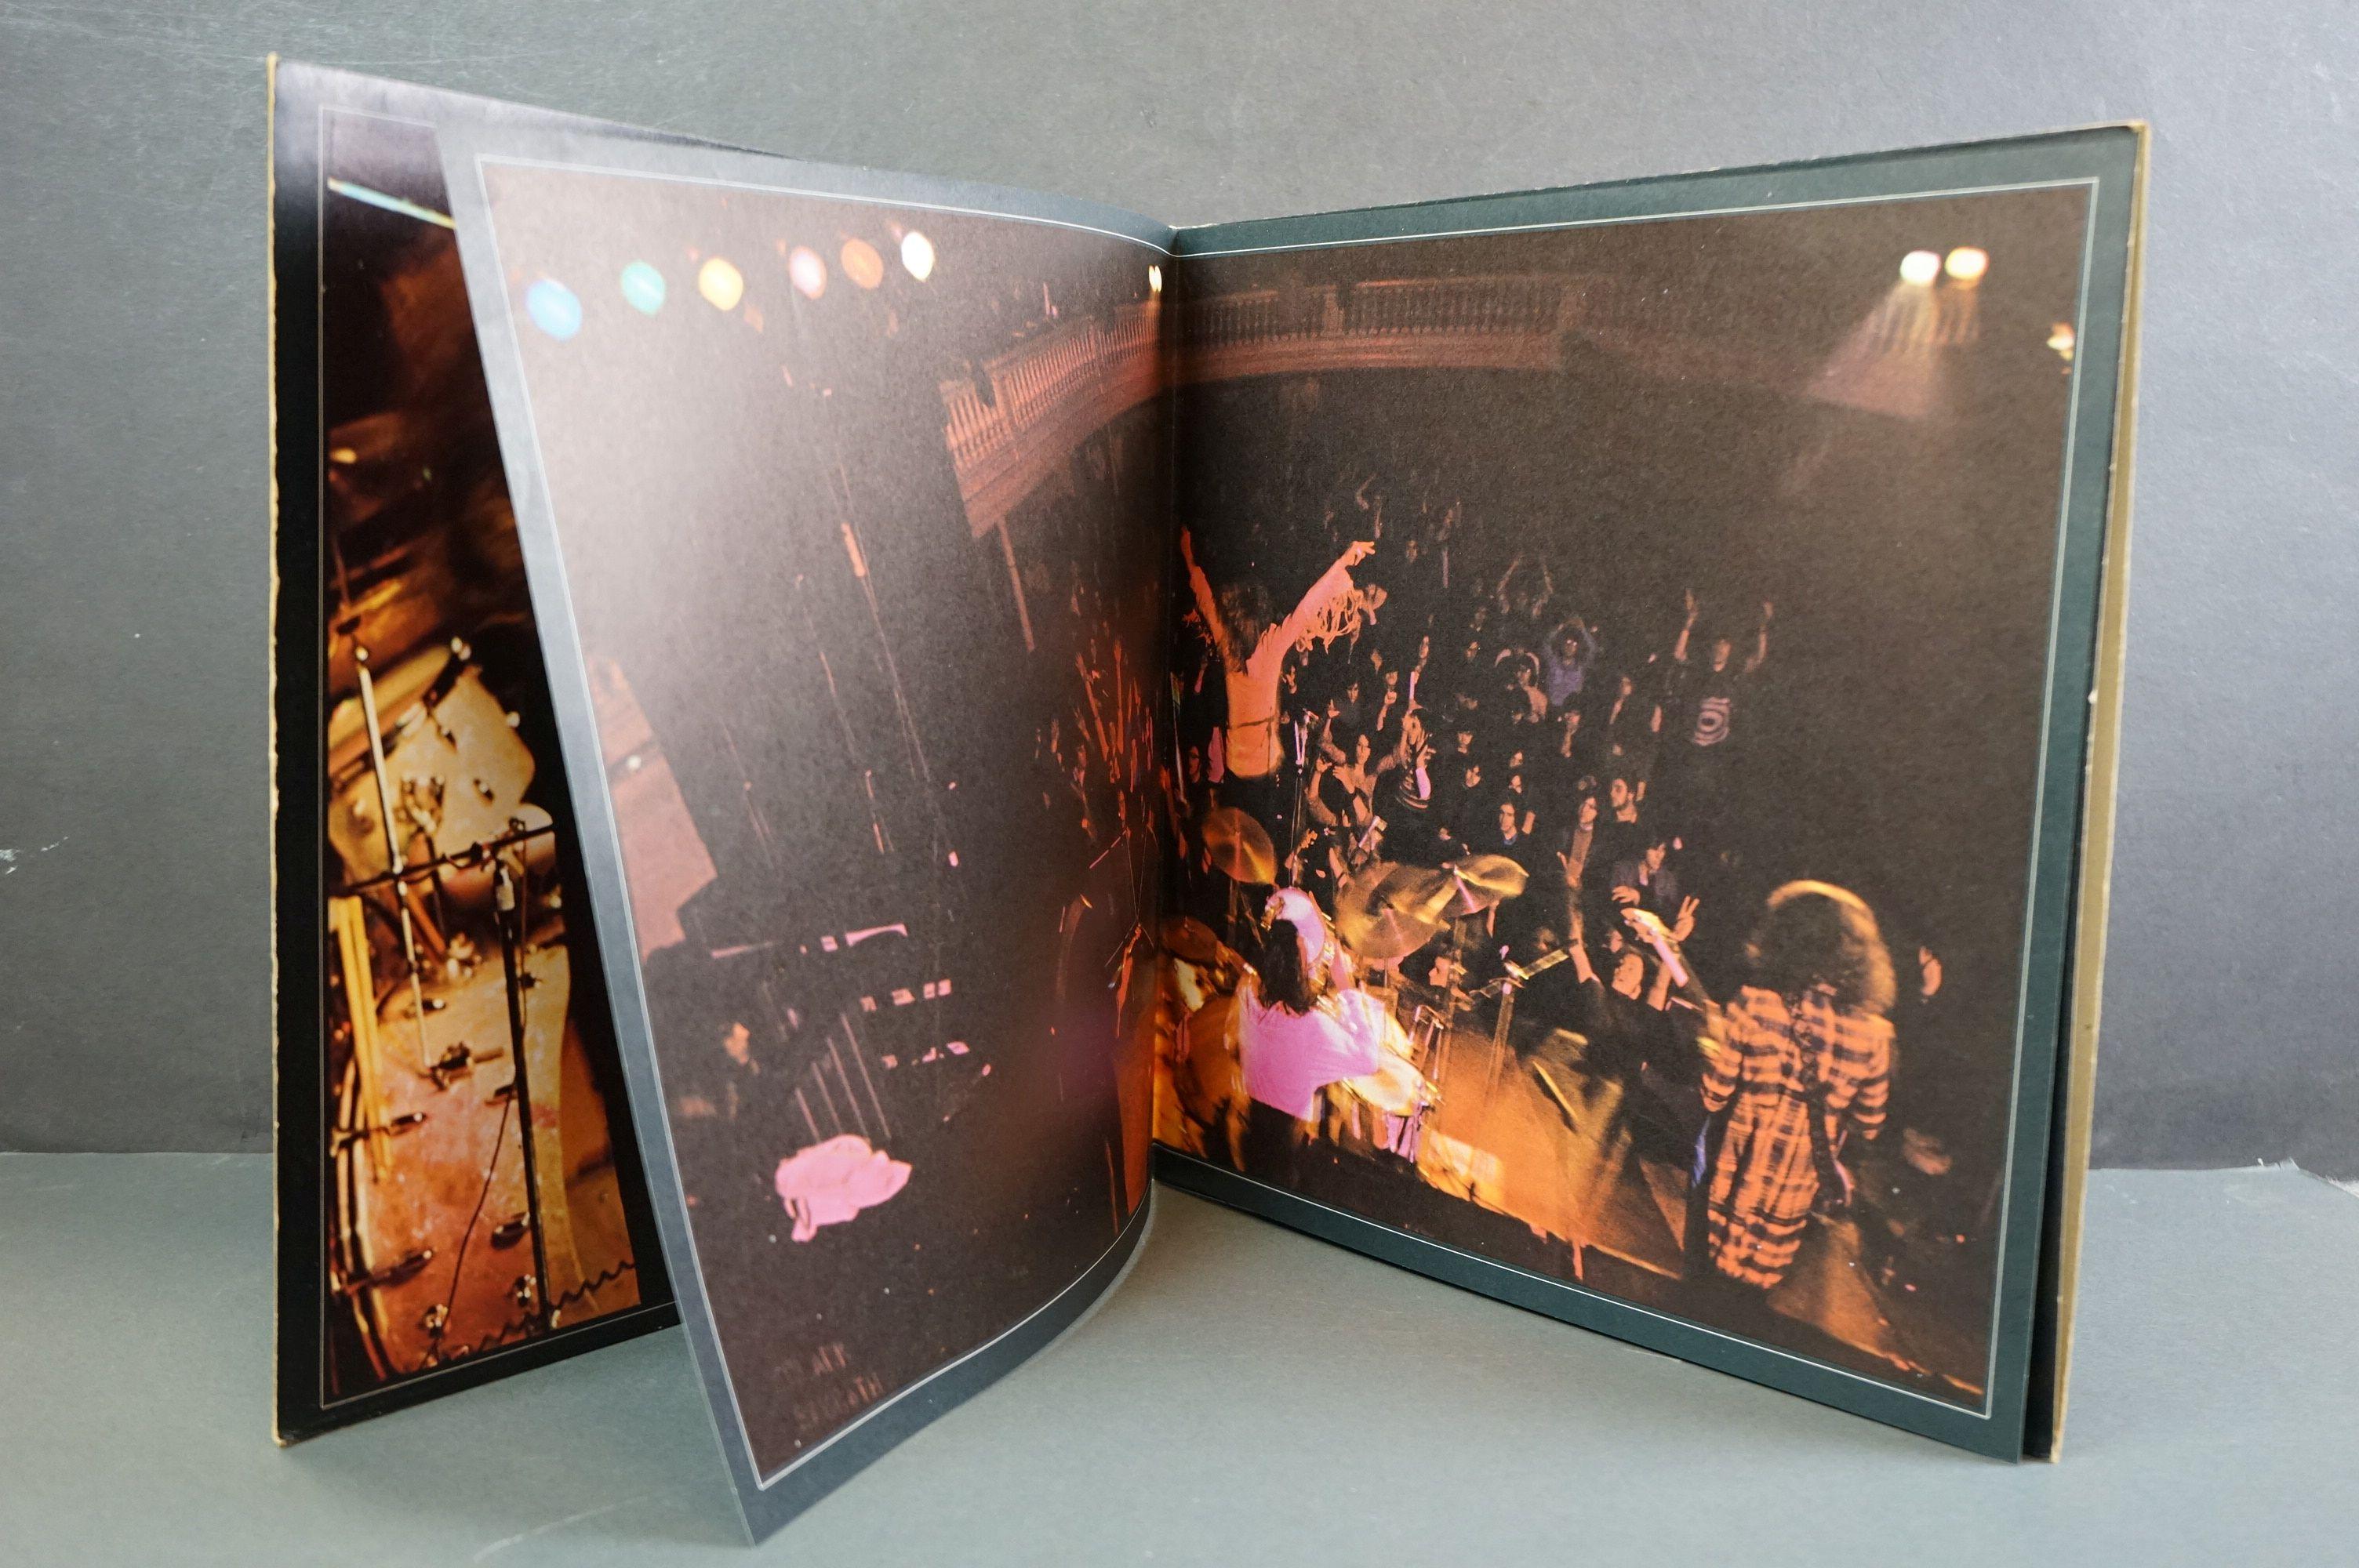 Vinyl - Black Sabbath vol 4 6360071 on Vertigo 1st pressing, no 'made in England' to label, gatefold - Image 2 of 6